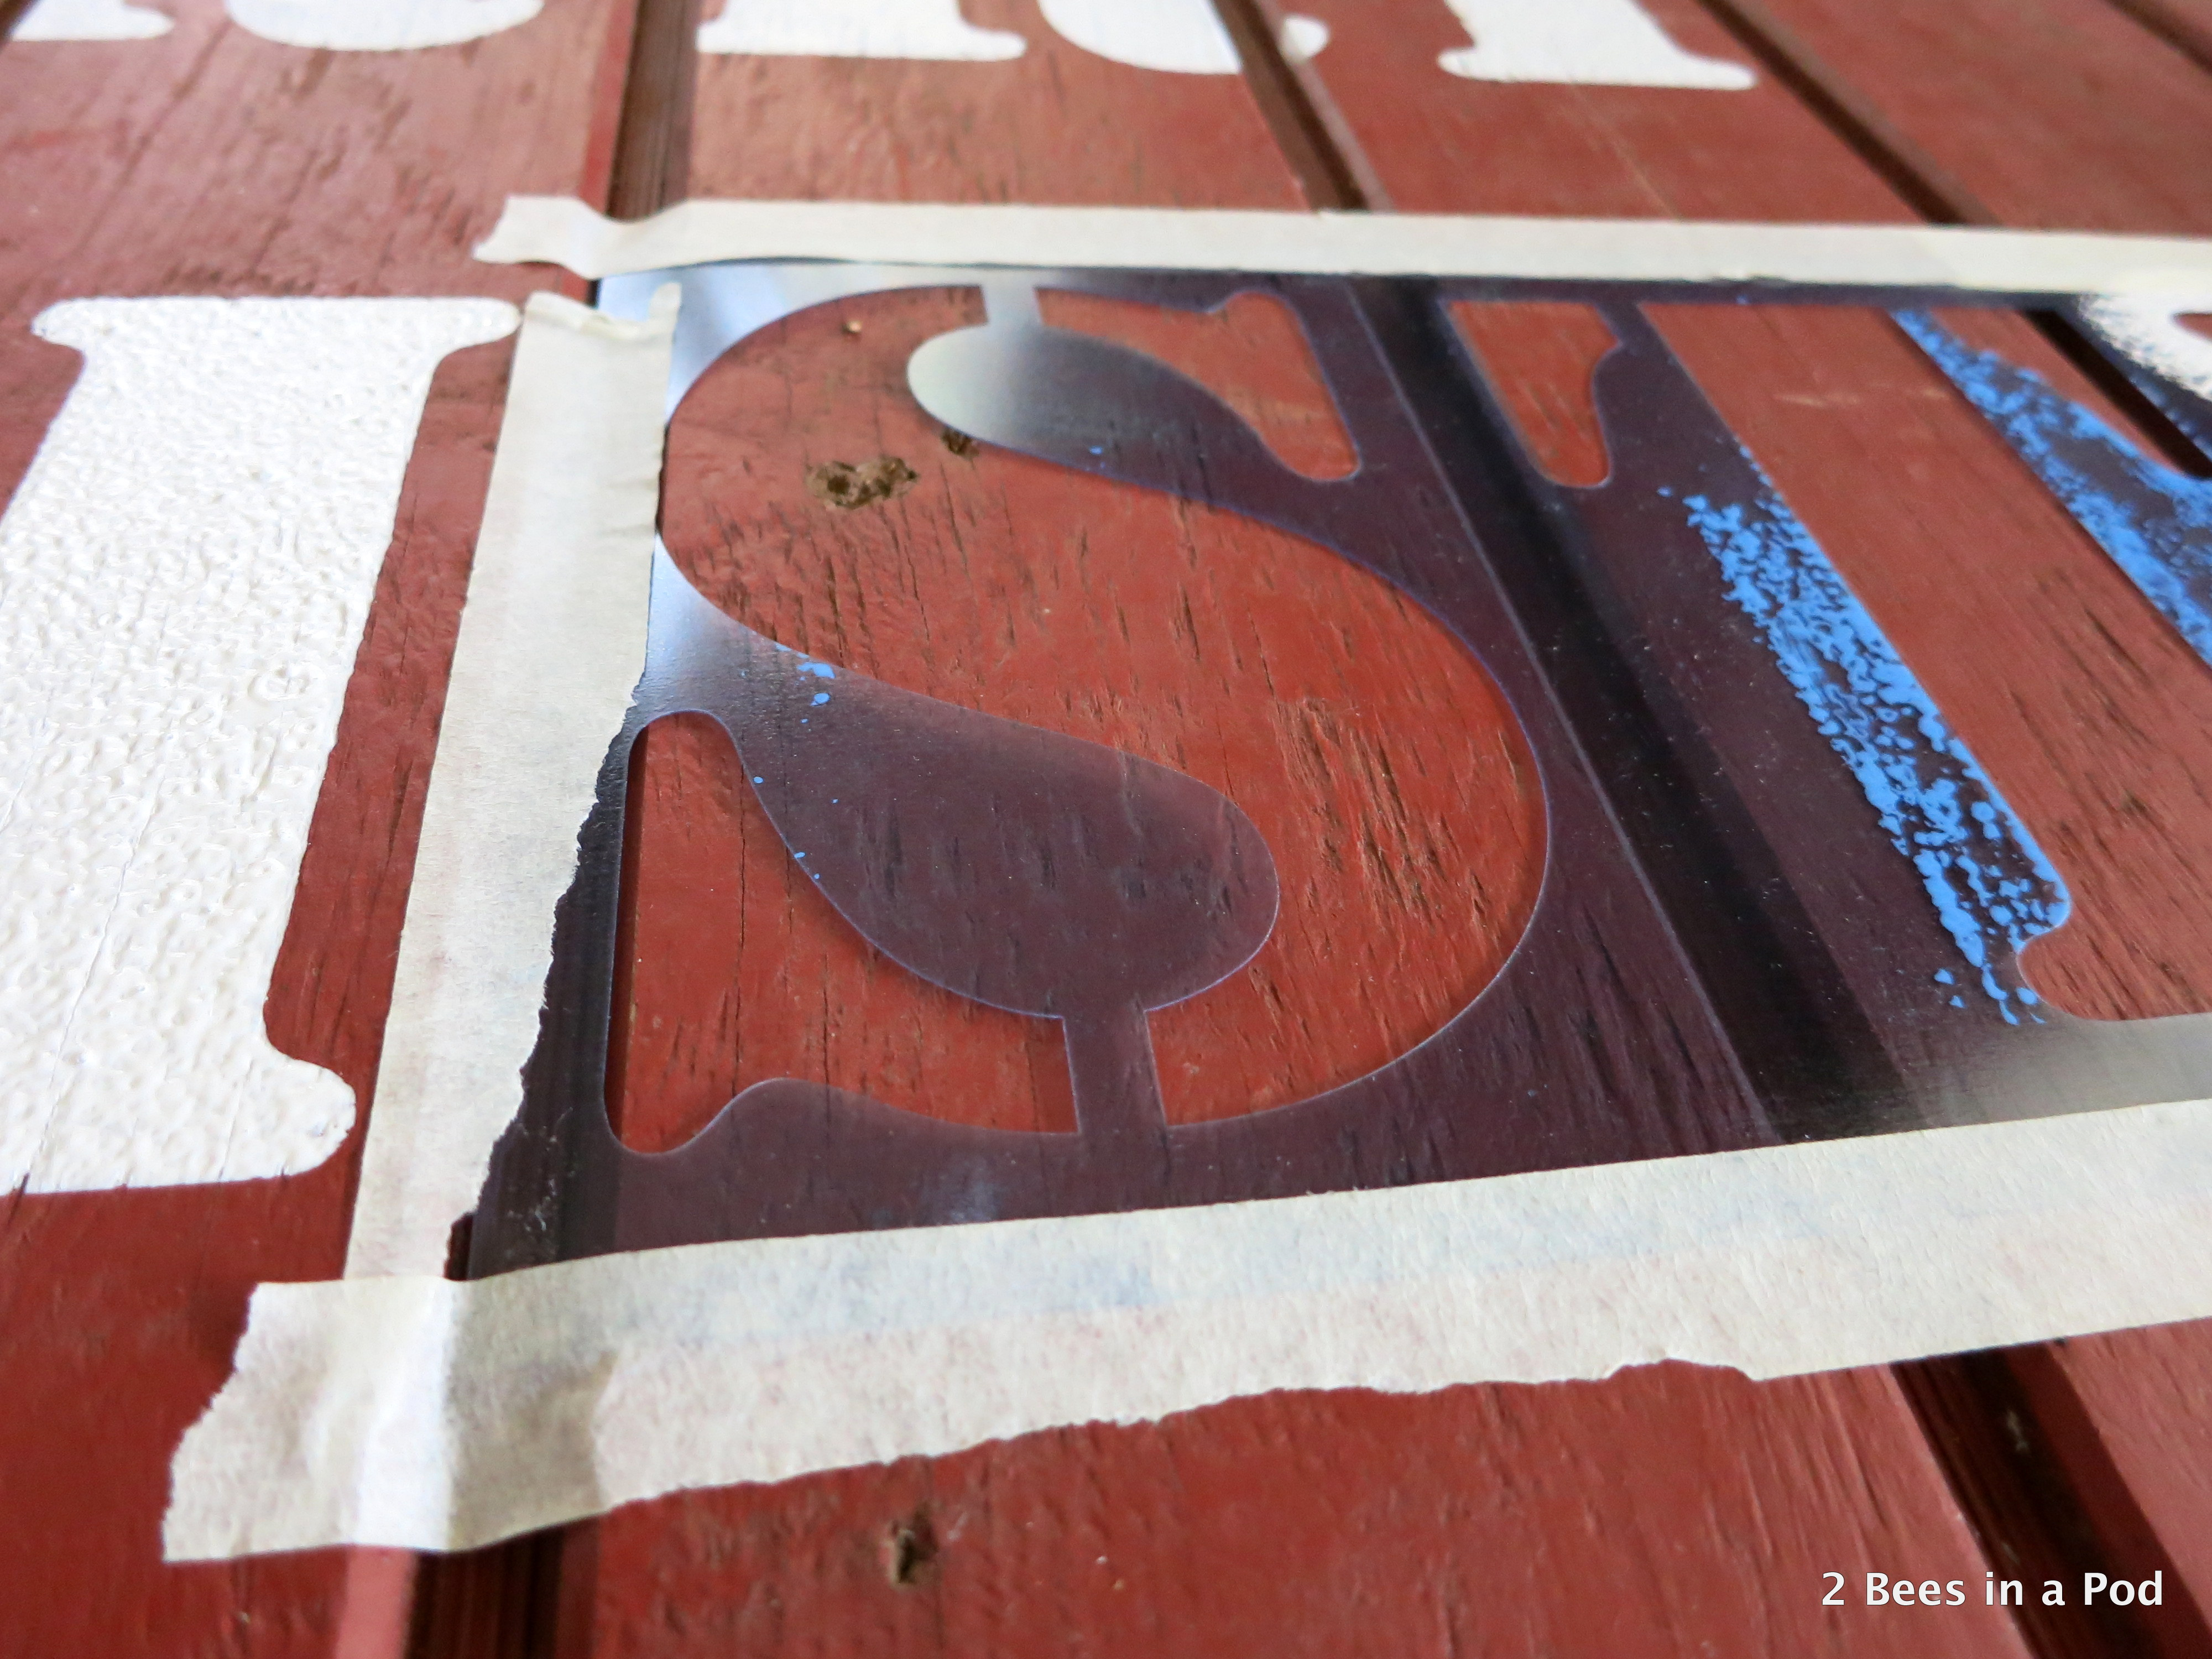 Rustic DIY Merry Christmas Handpainted Sign 2